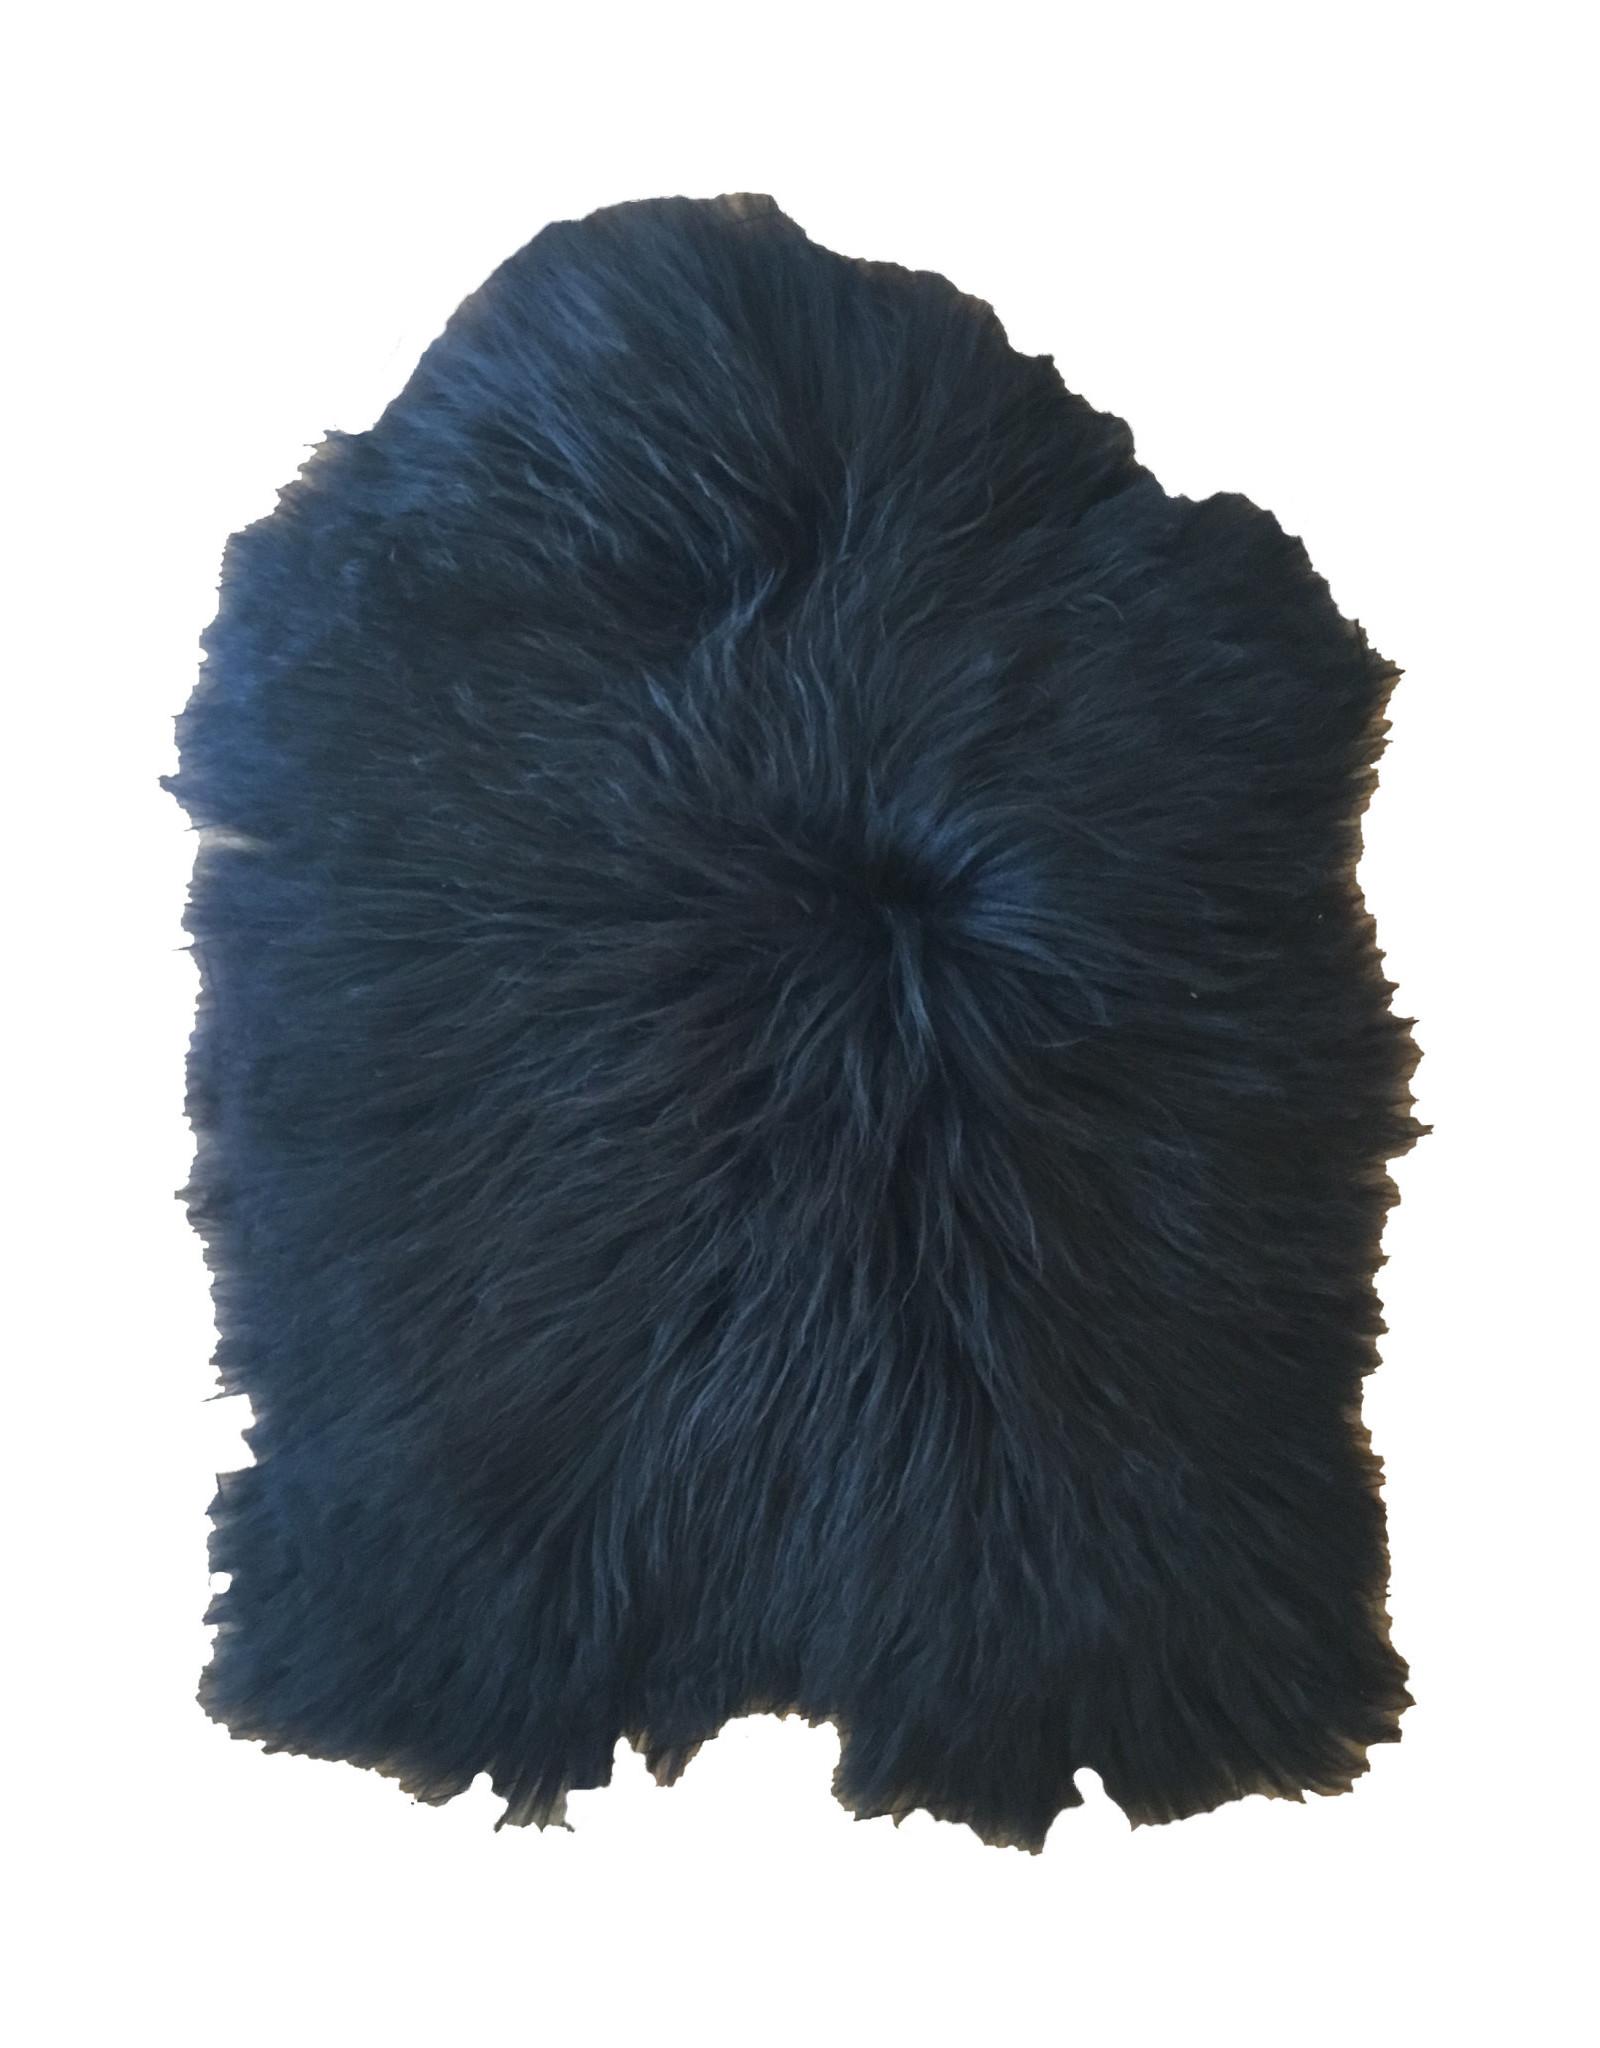 Sheepskin Rug - Iceland Black/Brown